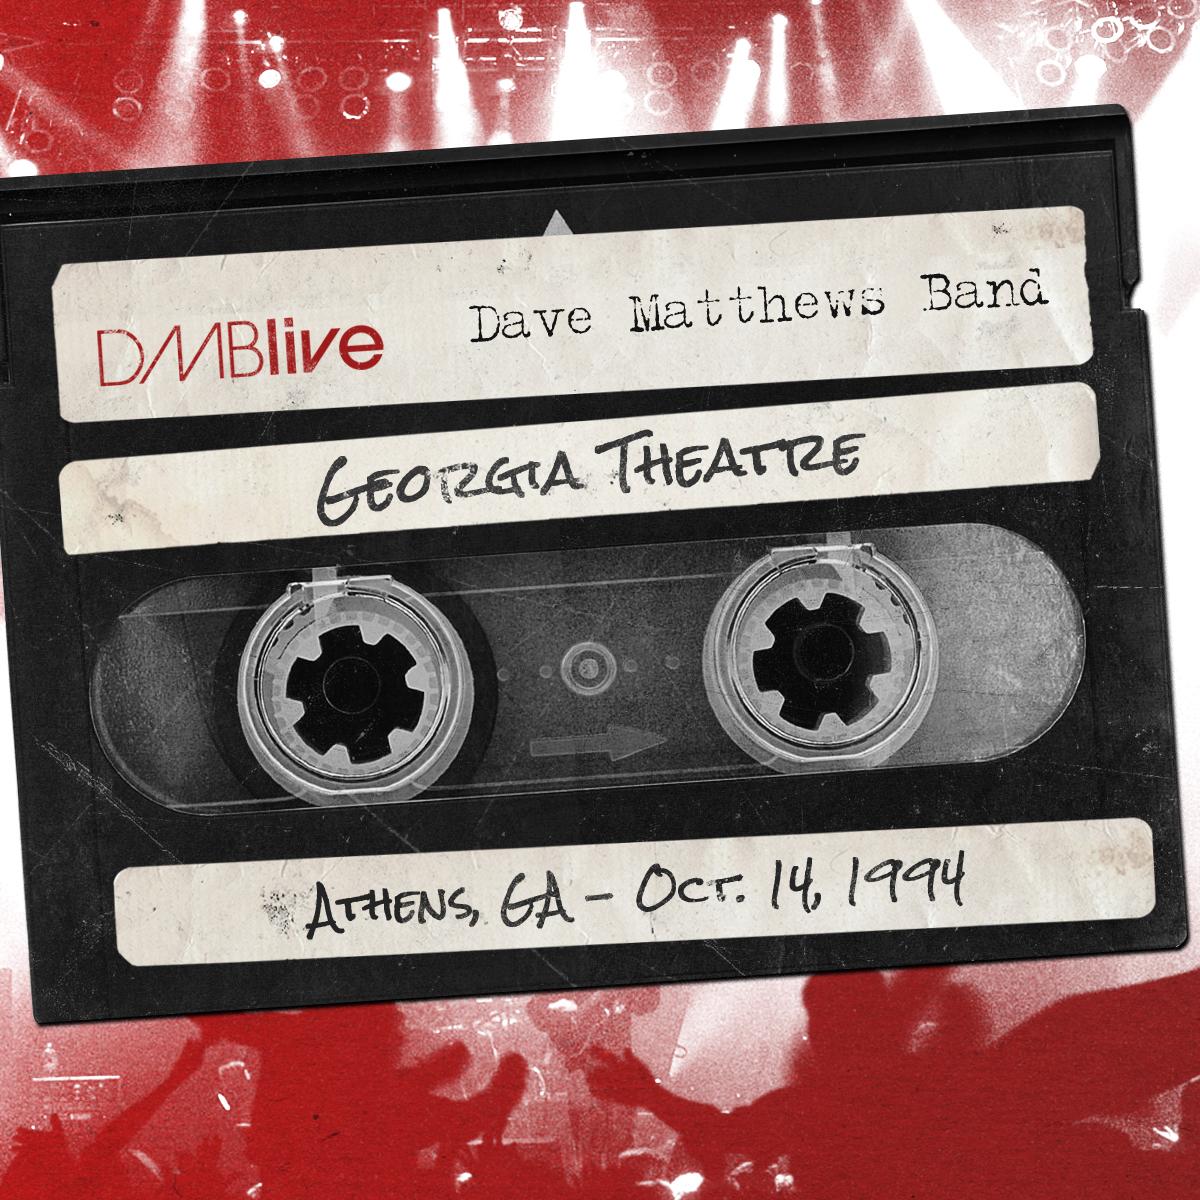 DMBLive Georgia Theatre, Athens, GA 10/14/1994